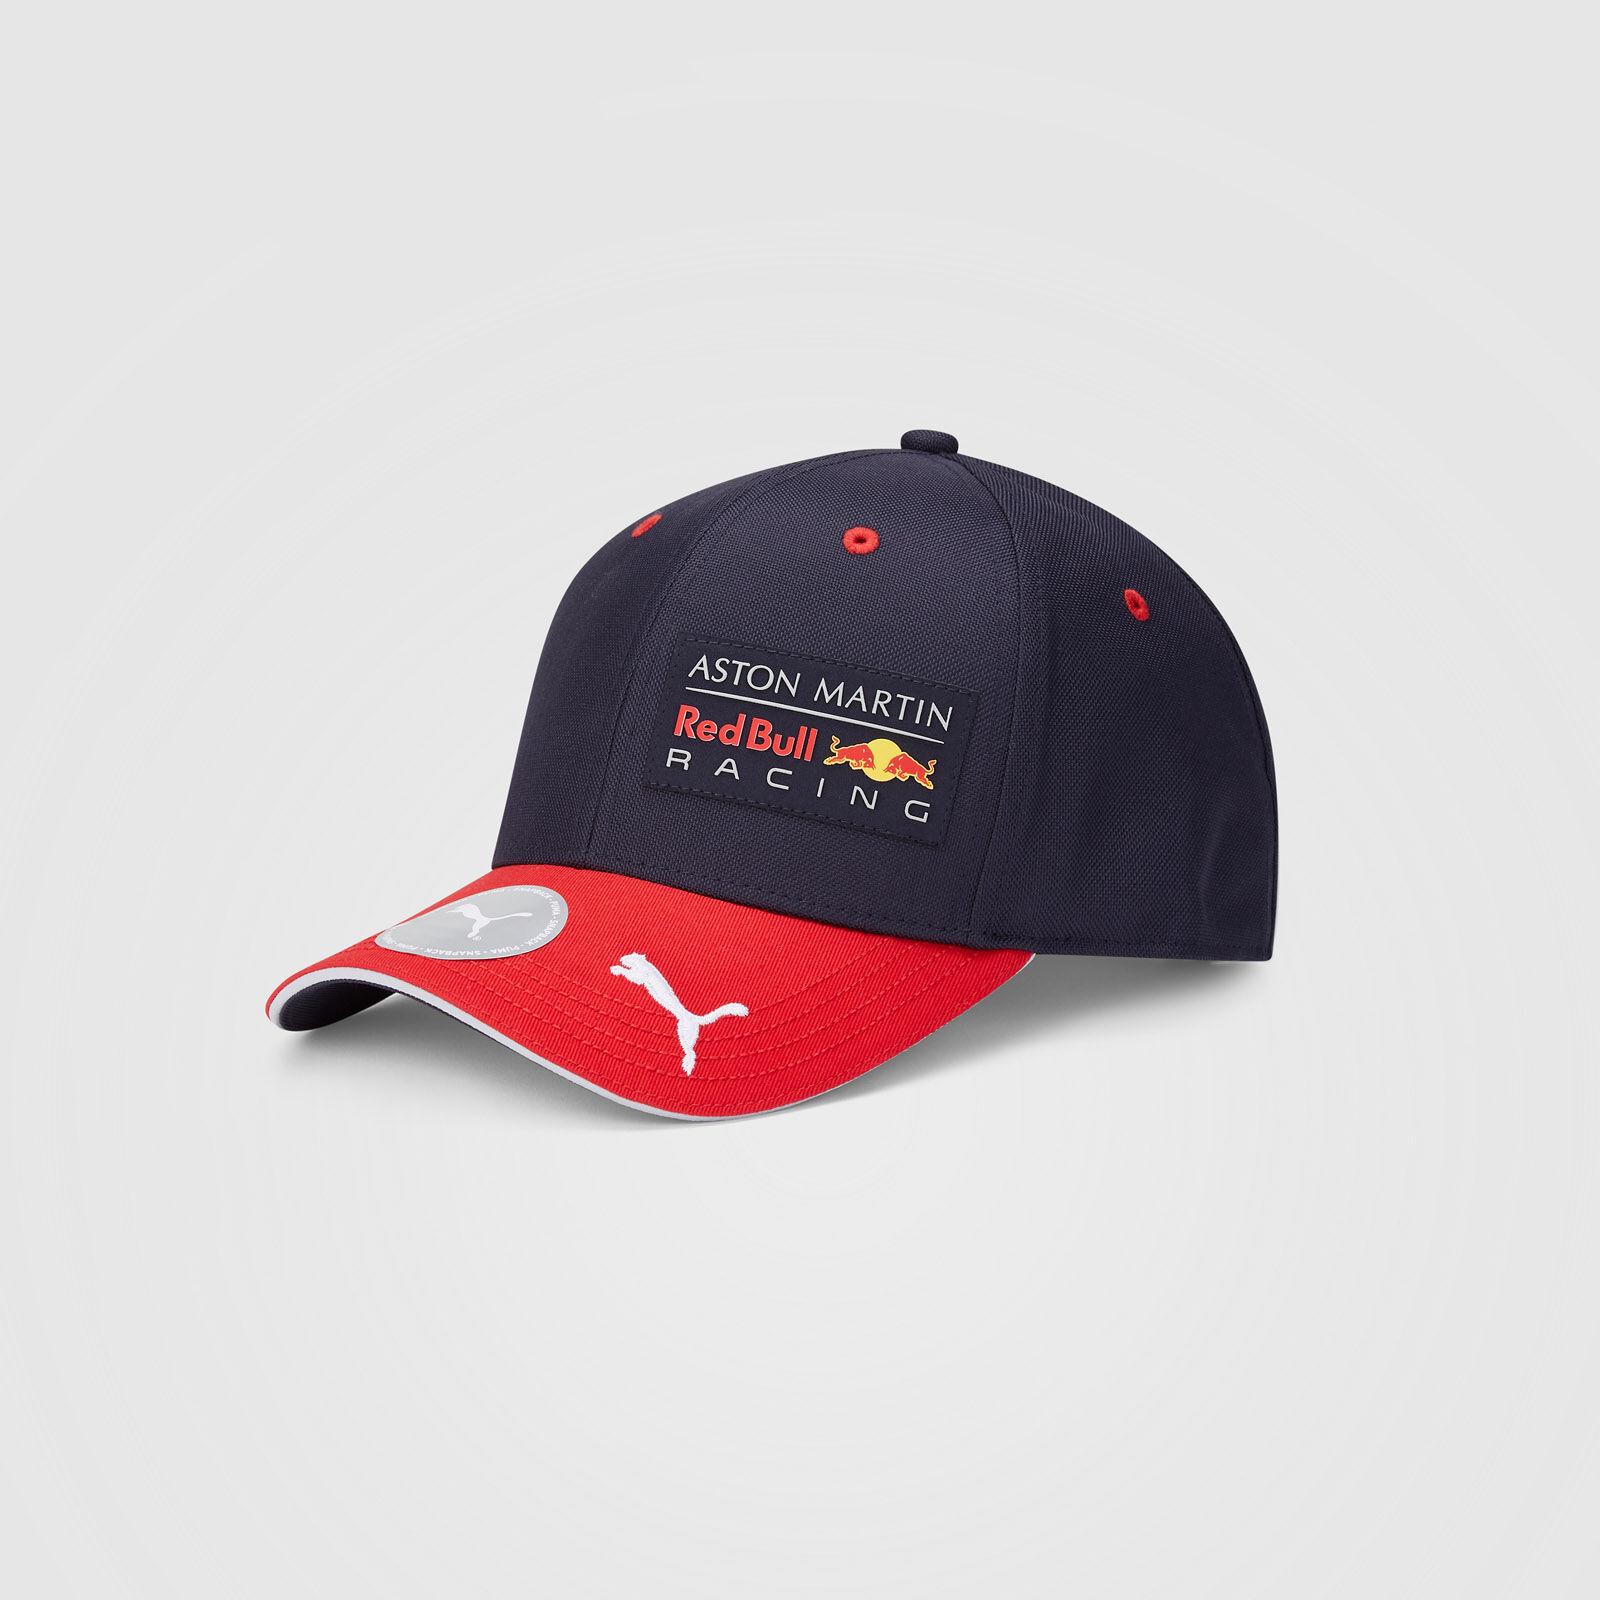 Team Kappe 2020 Für Kinder Aston Martin Red Bull Racing Fuel For Fans